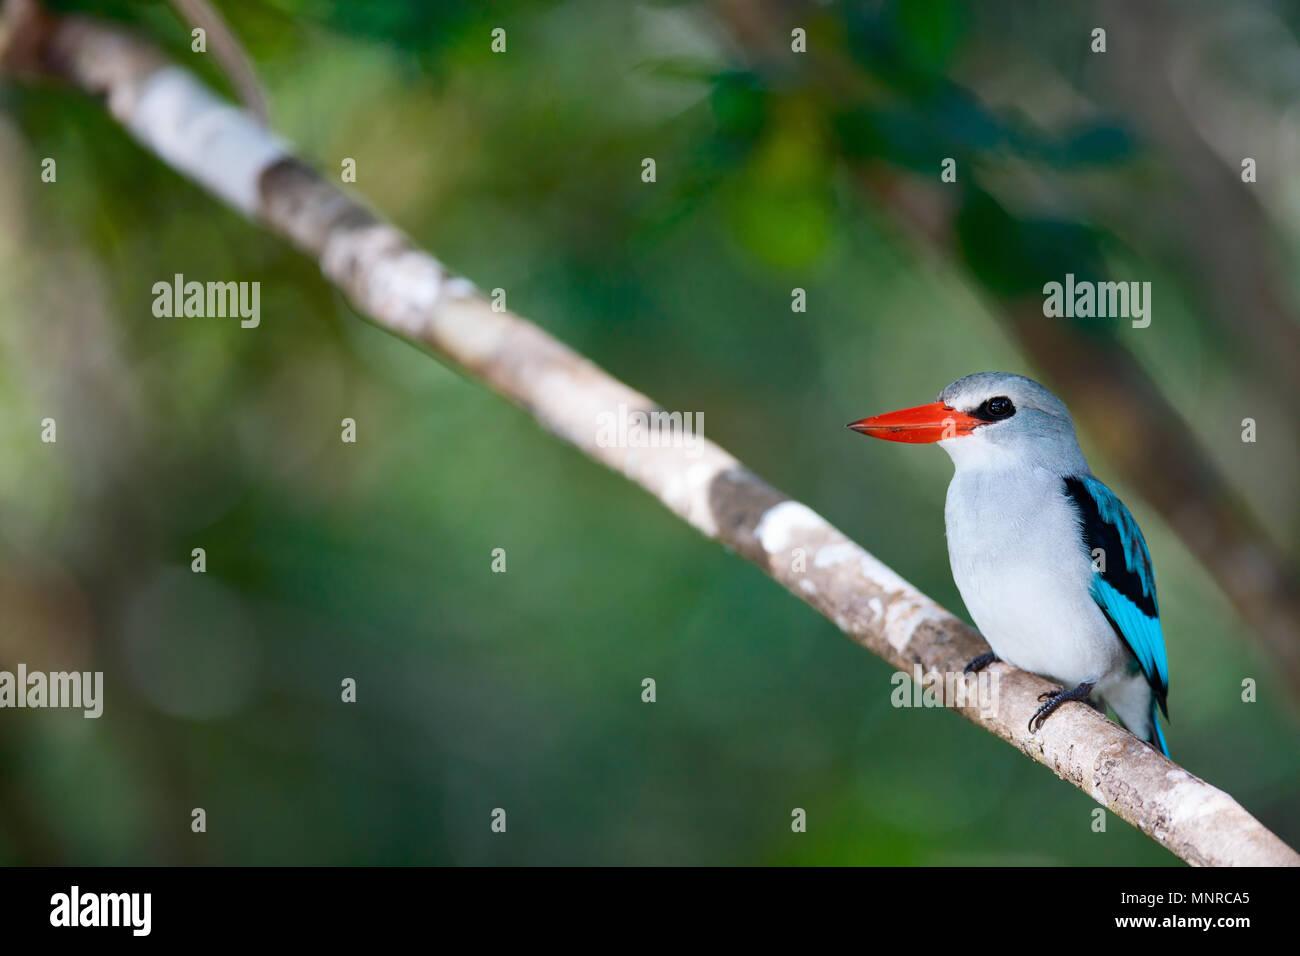 Kingfisher en Mozambique, África Imagen De Stock